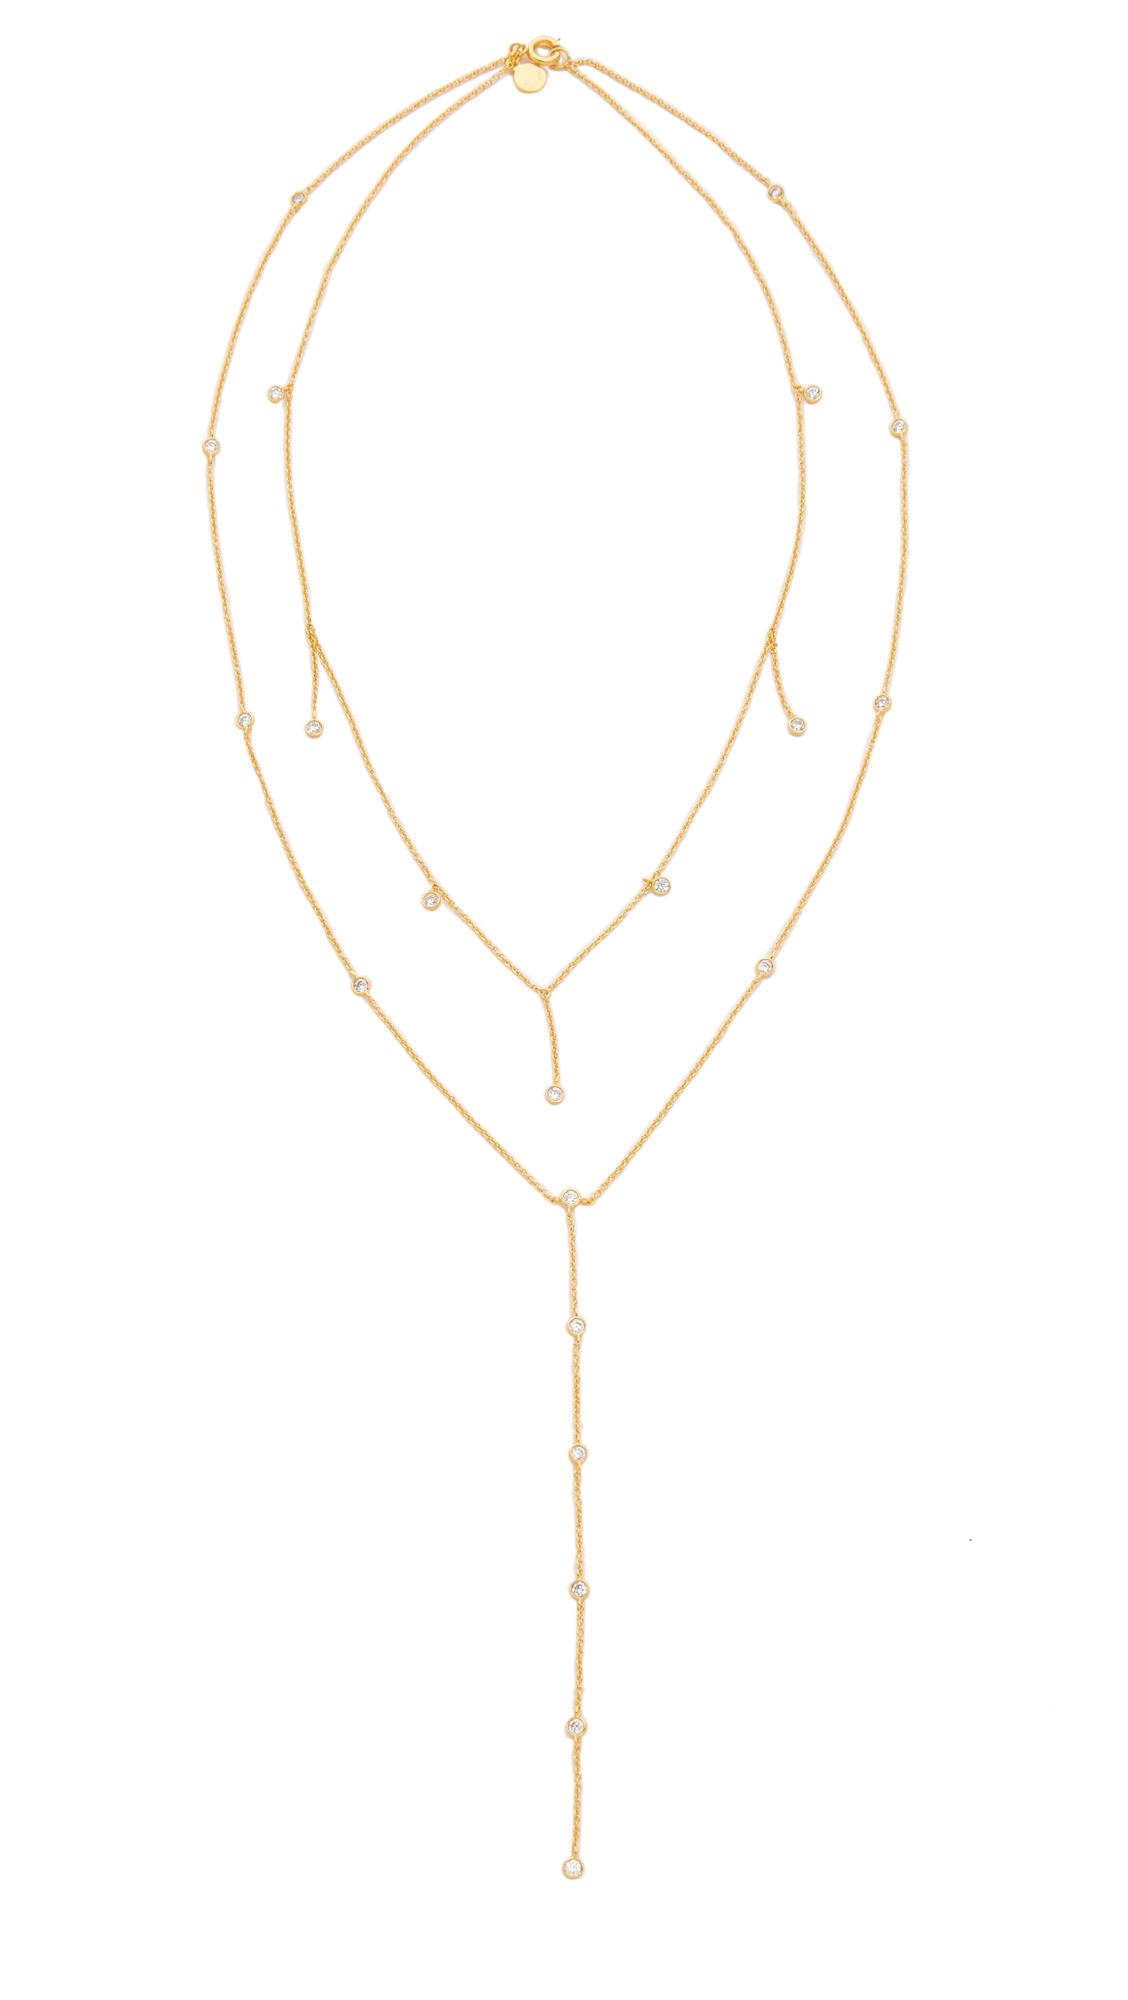 Gorjana Candice Shimmer Layered Lariat Necklace in Gold (Metallic)